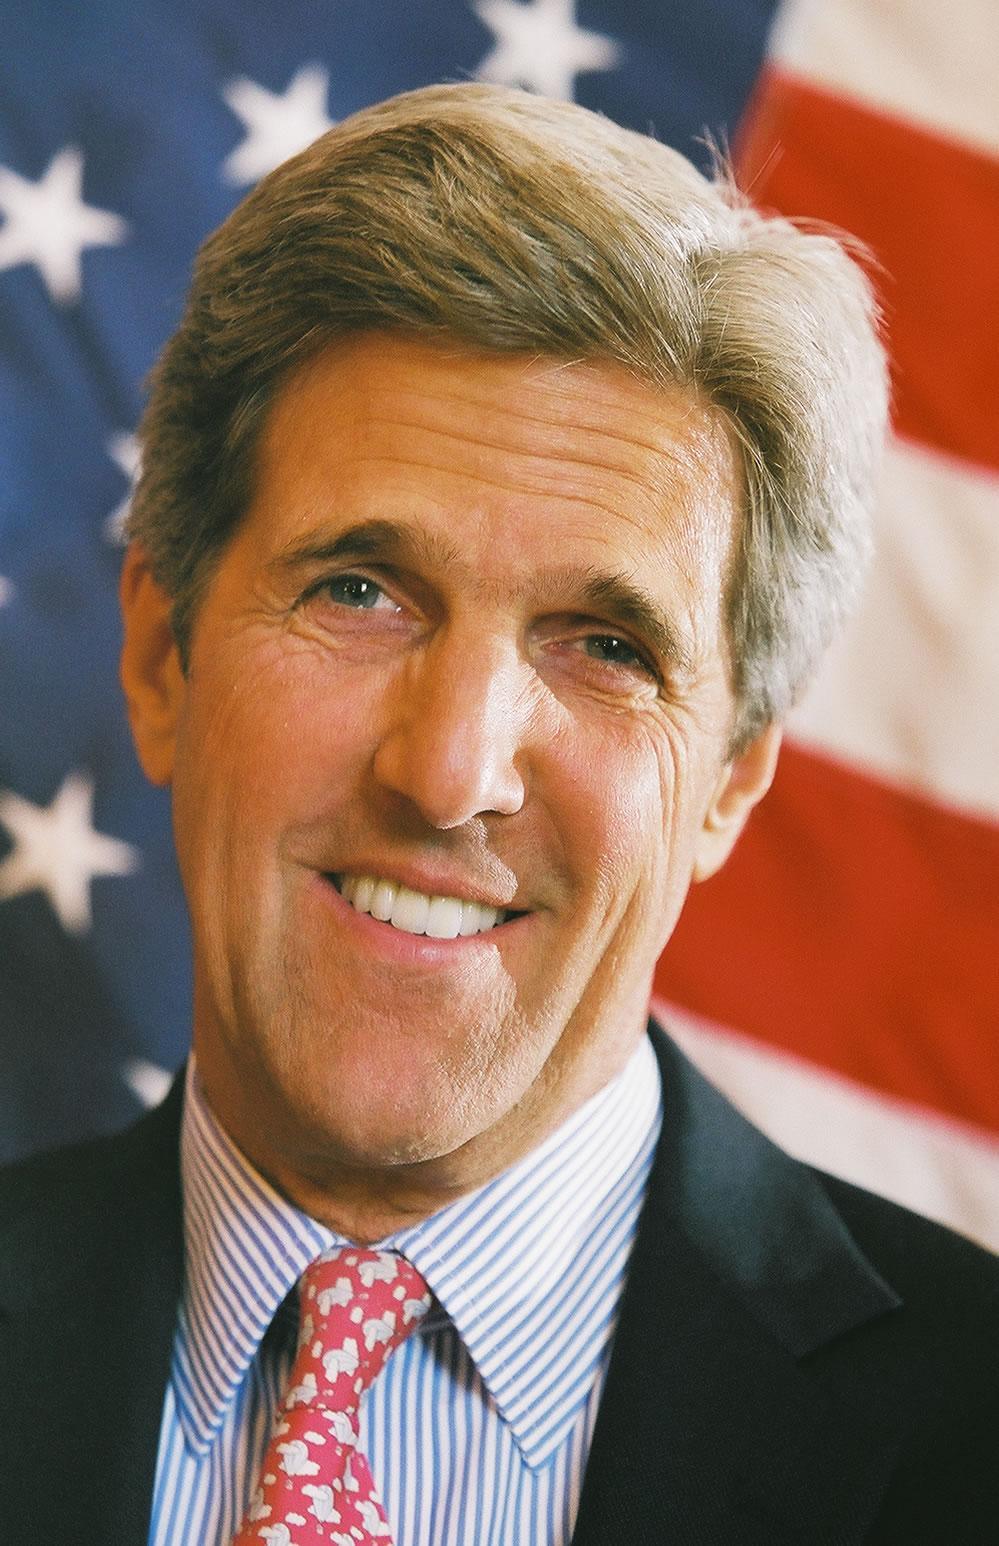 American Politician John Kerry Apologizes For Iraq War